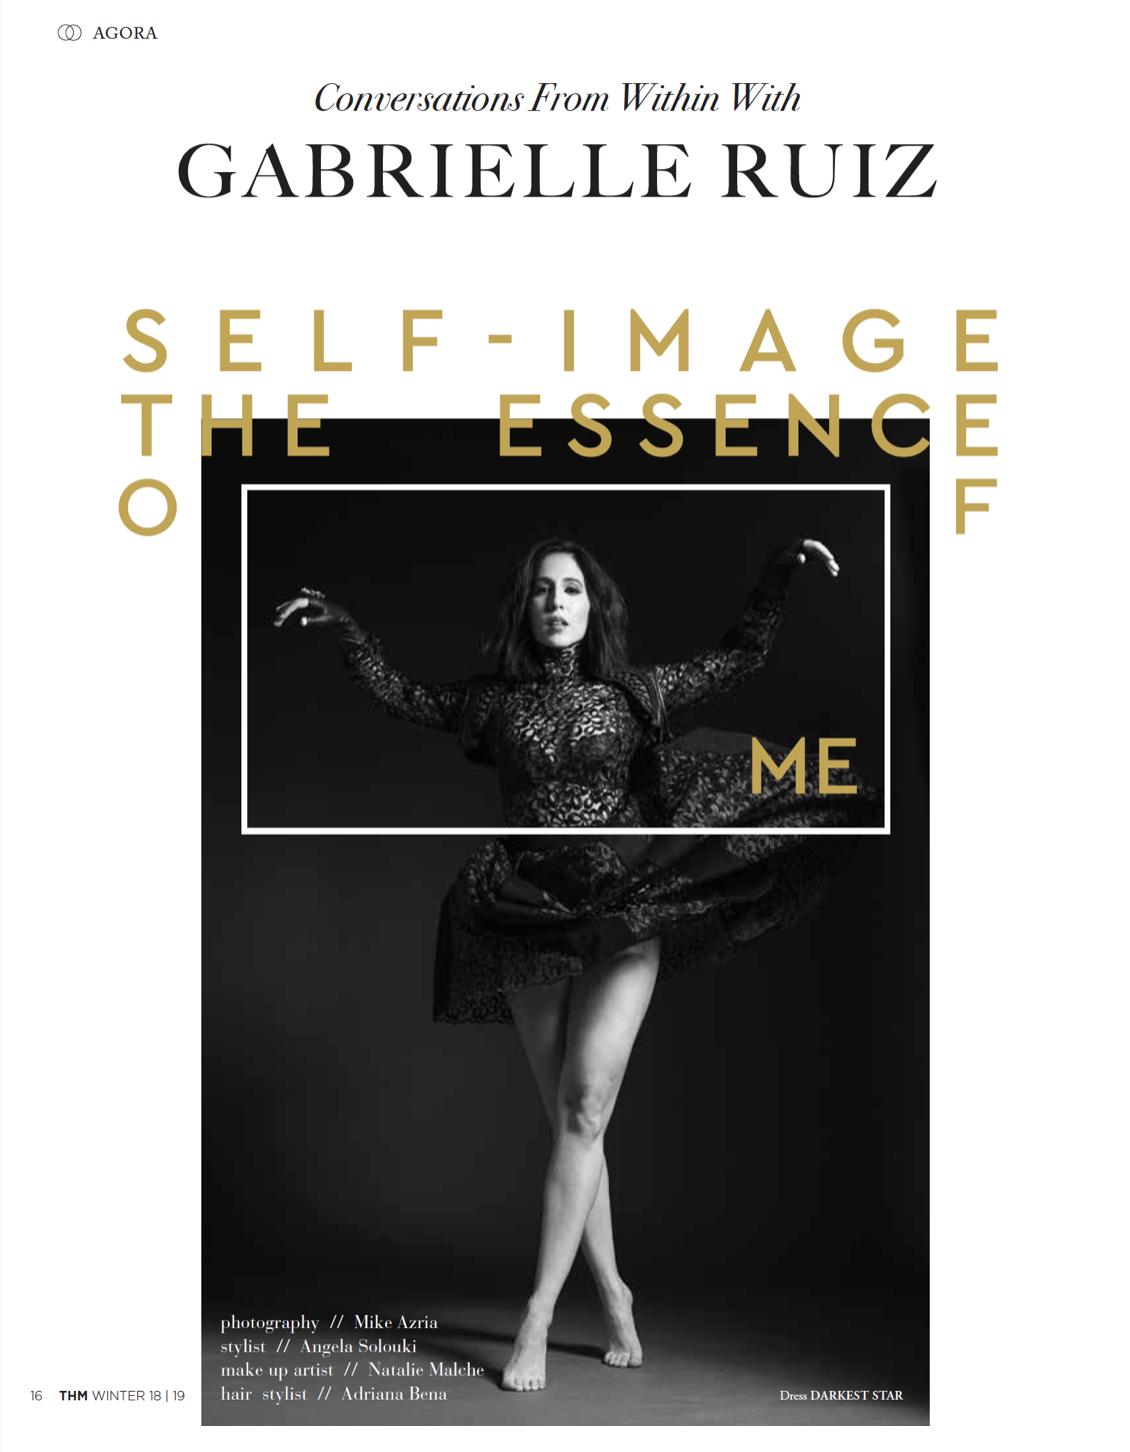 Gabrielle Ruiz for The Hedonist Magazine